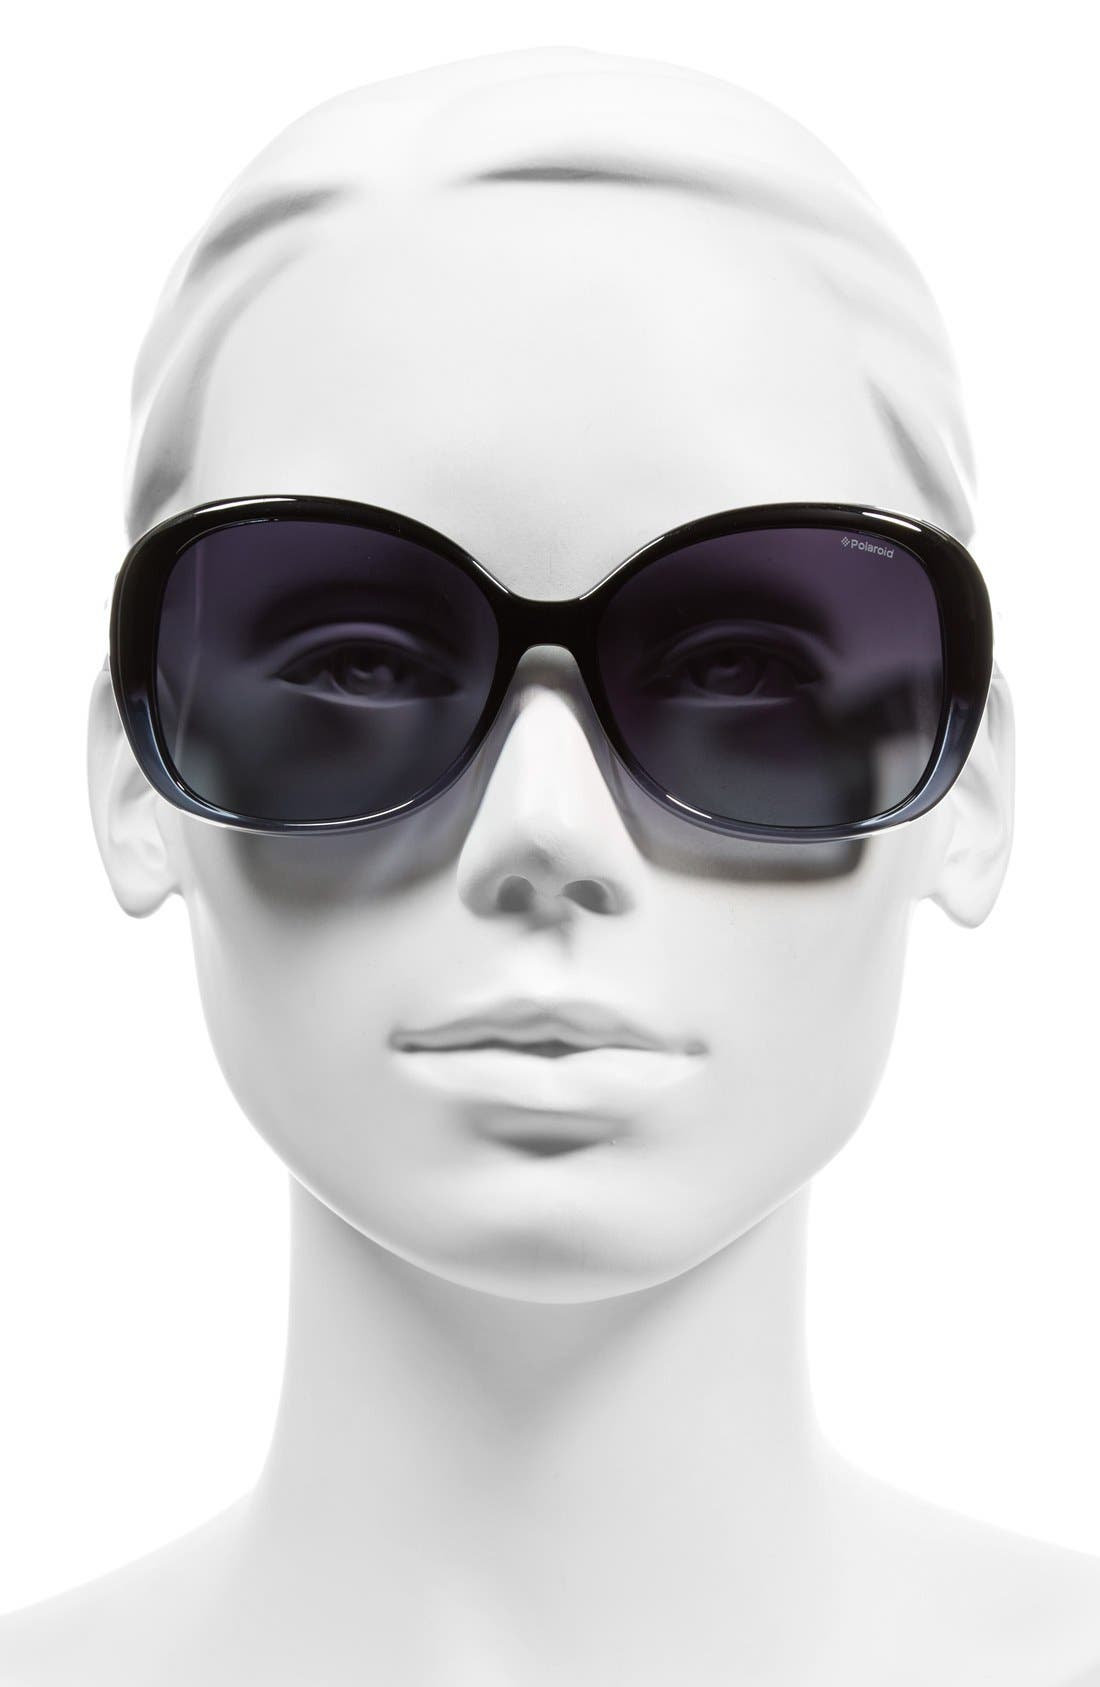 59mm Polarized Sunglasses,                             Alternate thumbnail 2, color,                             400